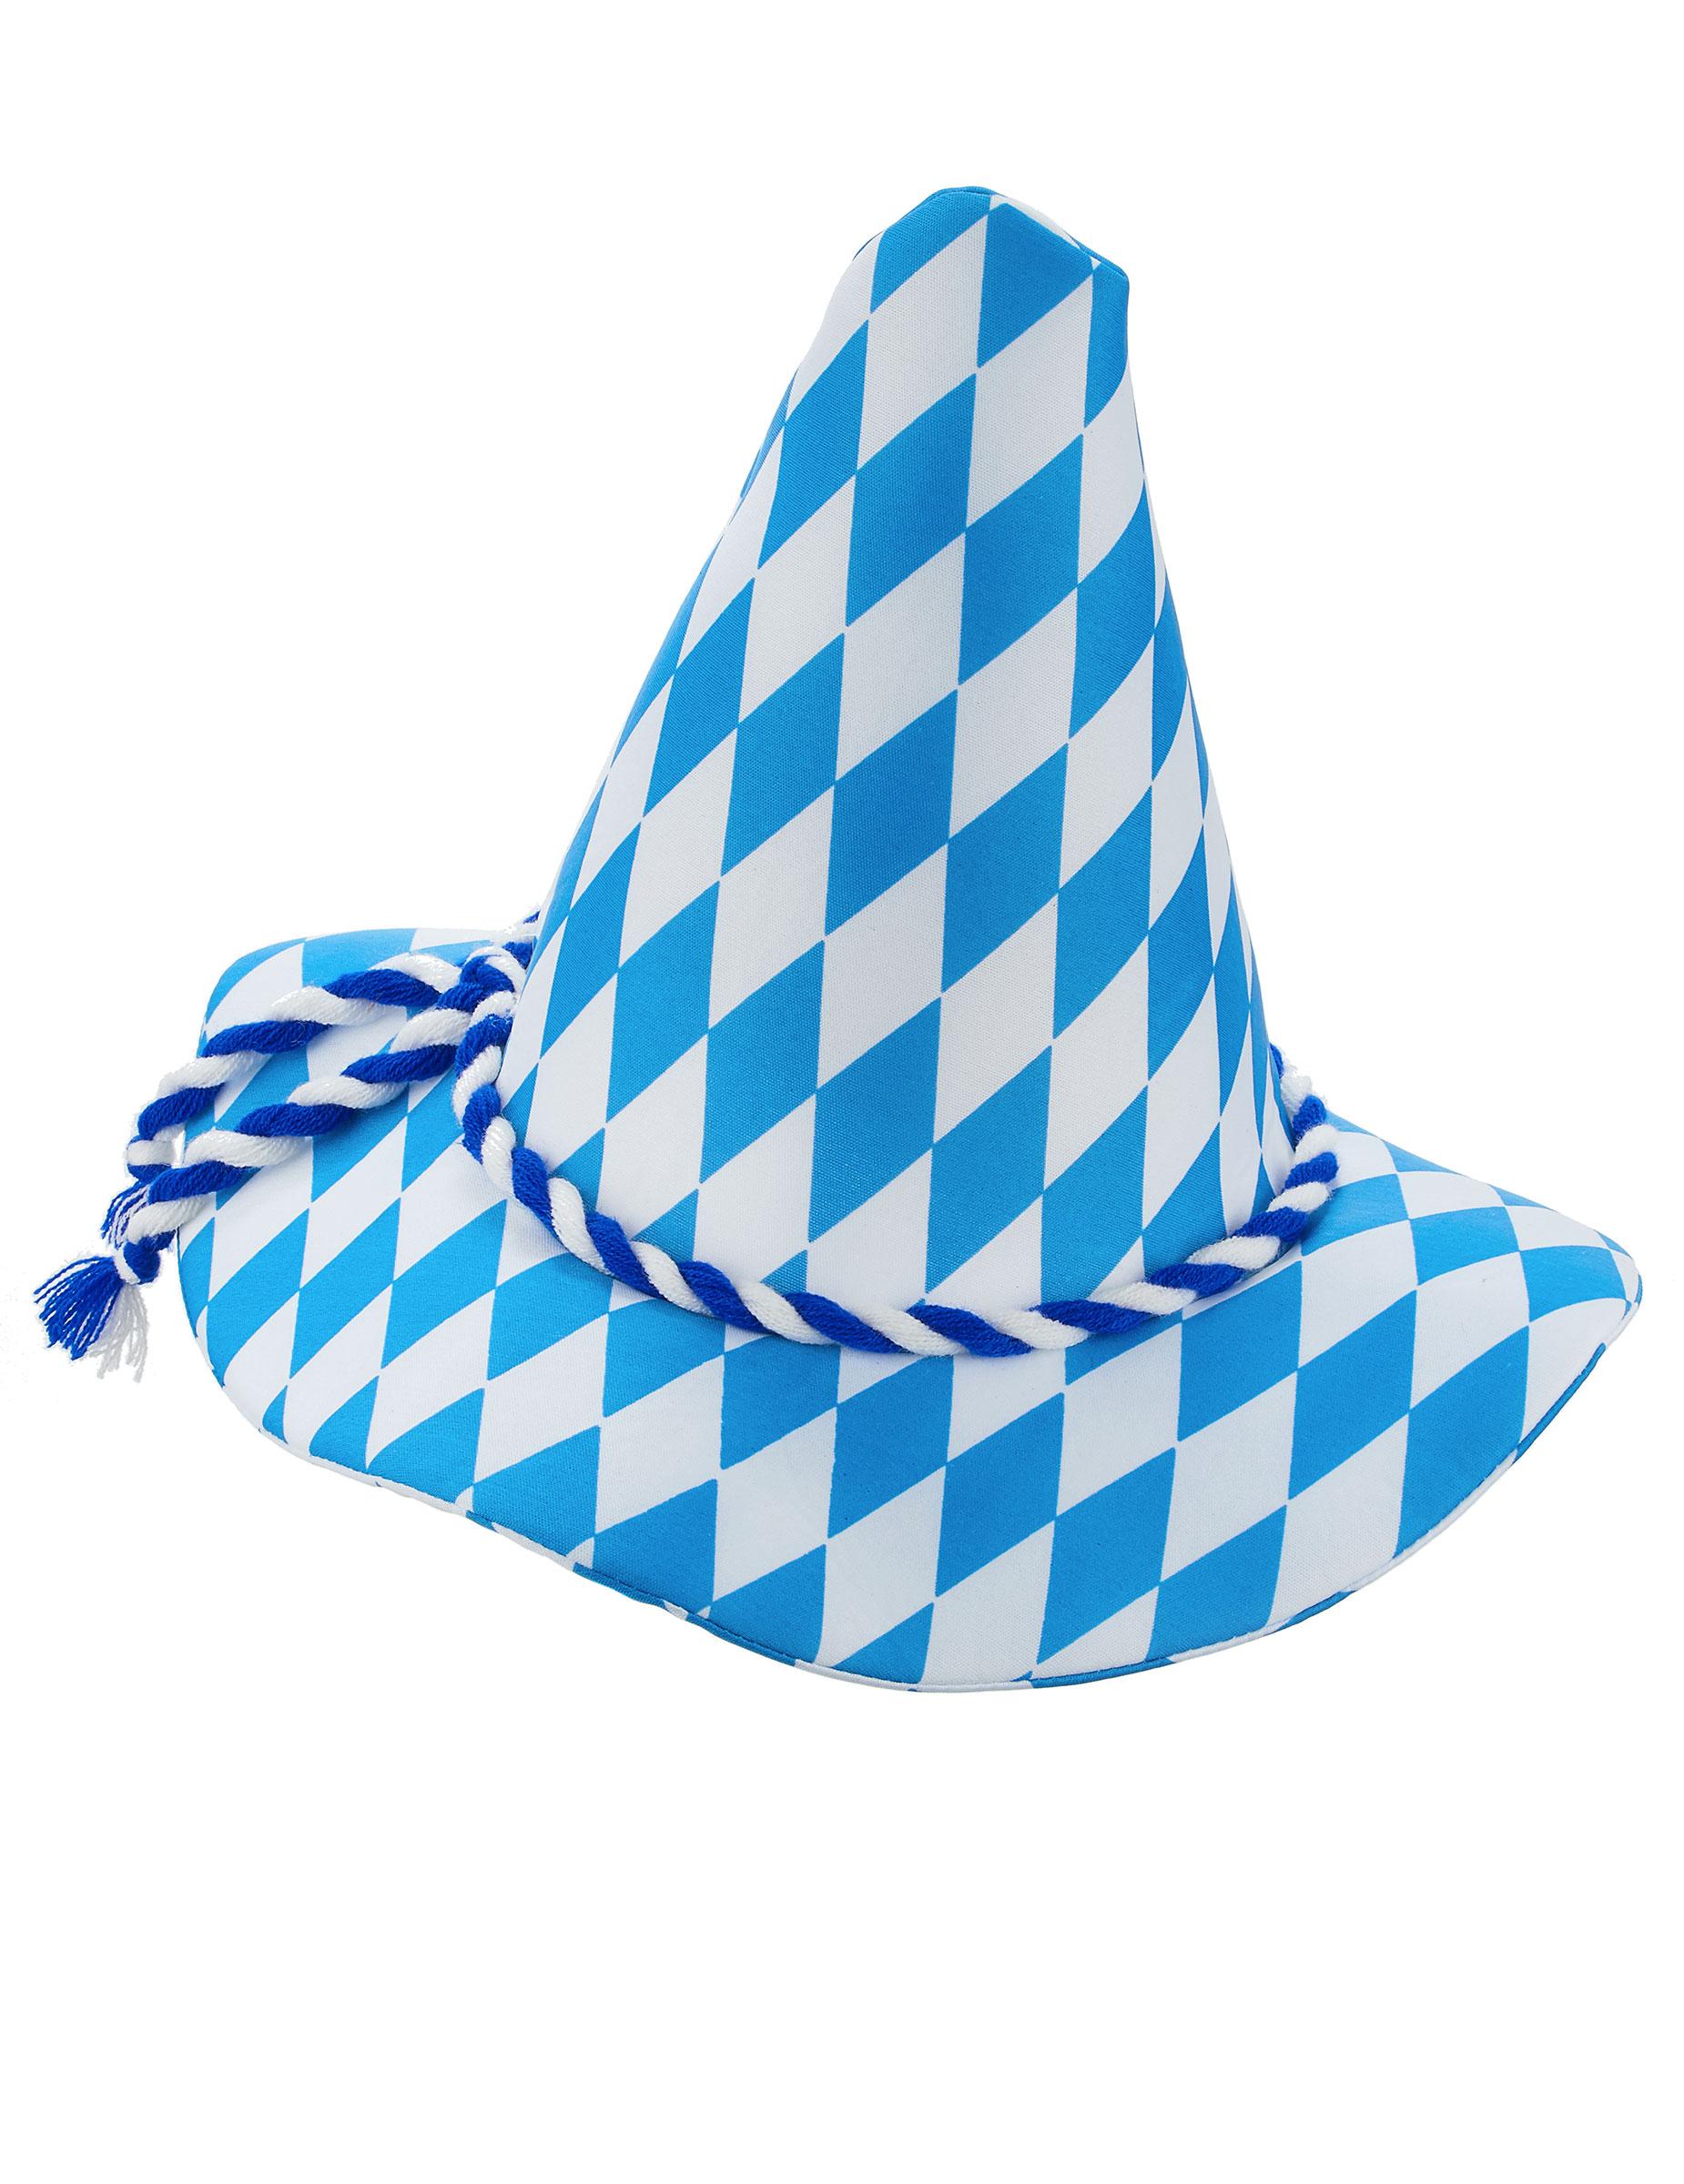 Cappello bavarese bianco e blu adulto  Cappelli 83b7e7c6cd10